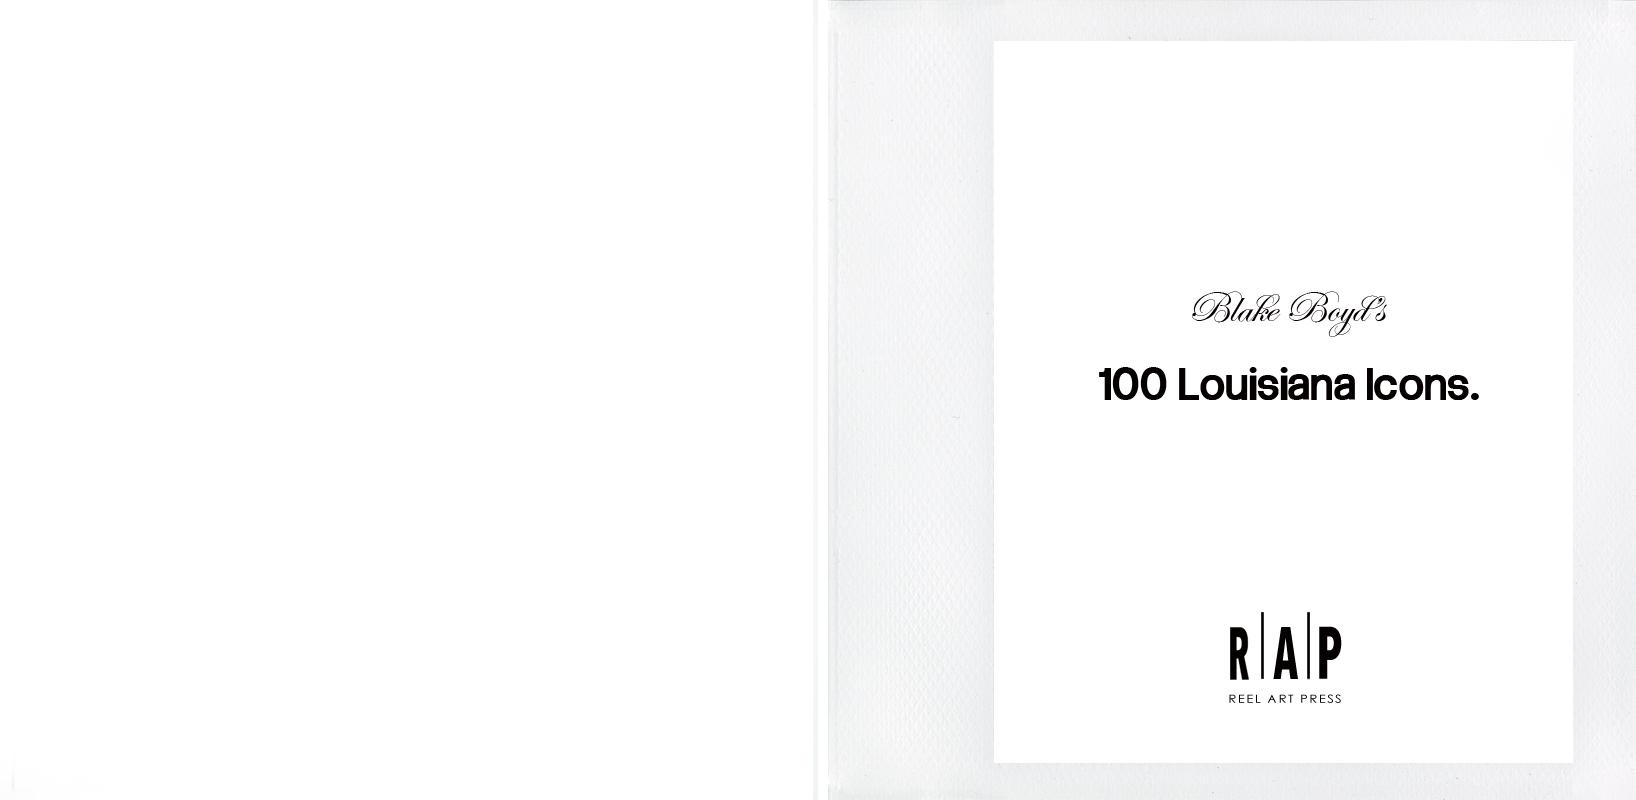 01. 1st page.jpg